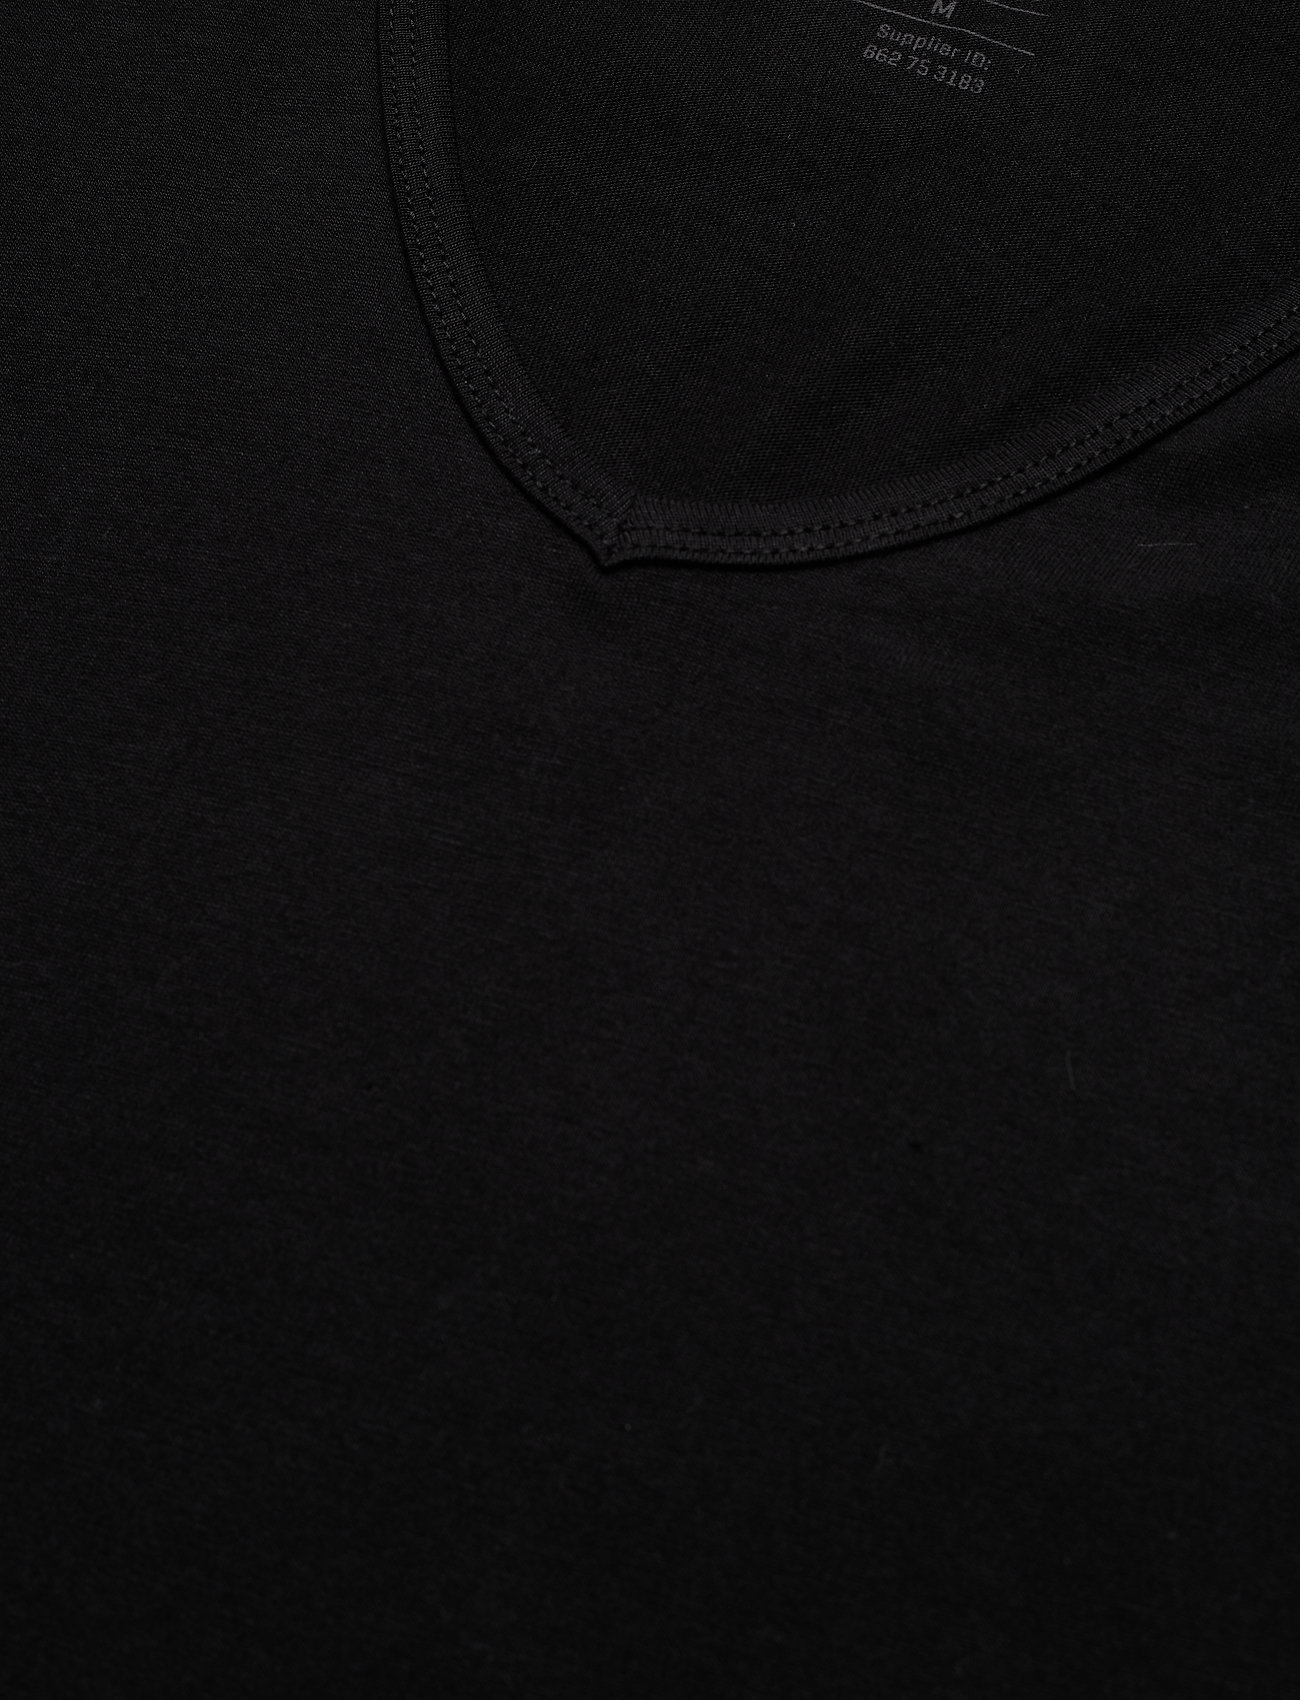 PUMA - PUMA BASIC 2P V-NECK - multipack - black - 1